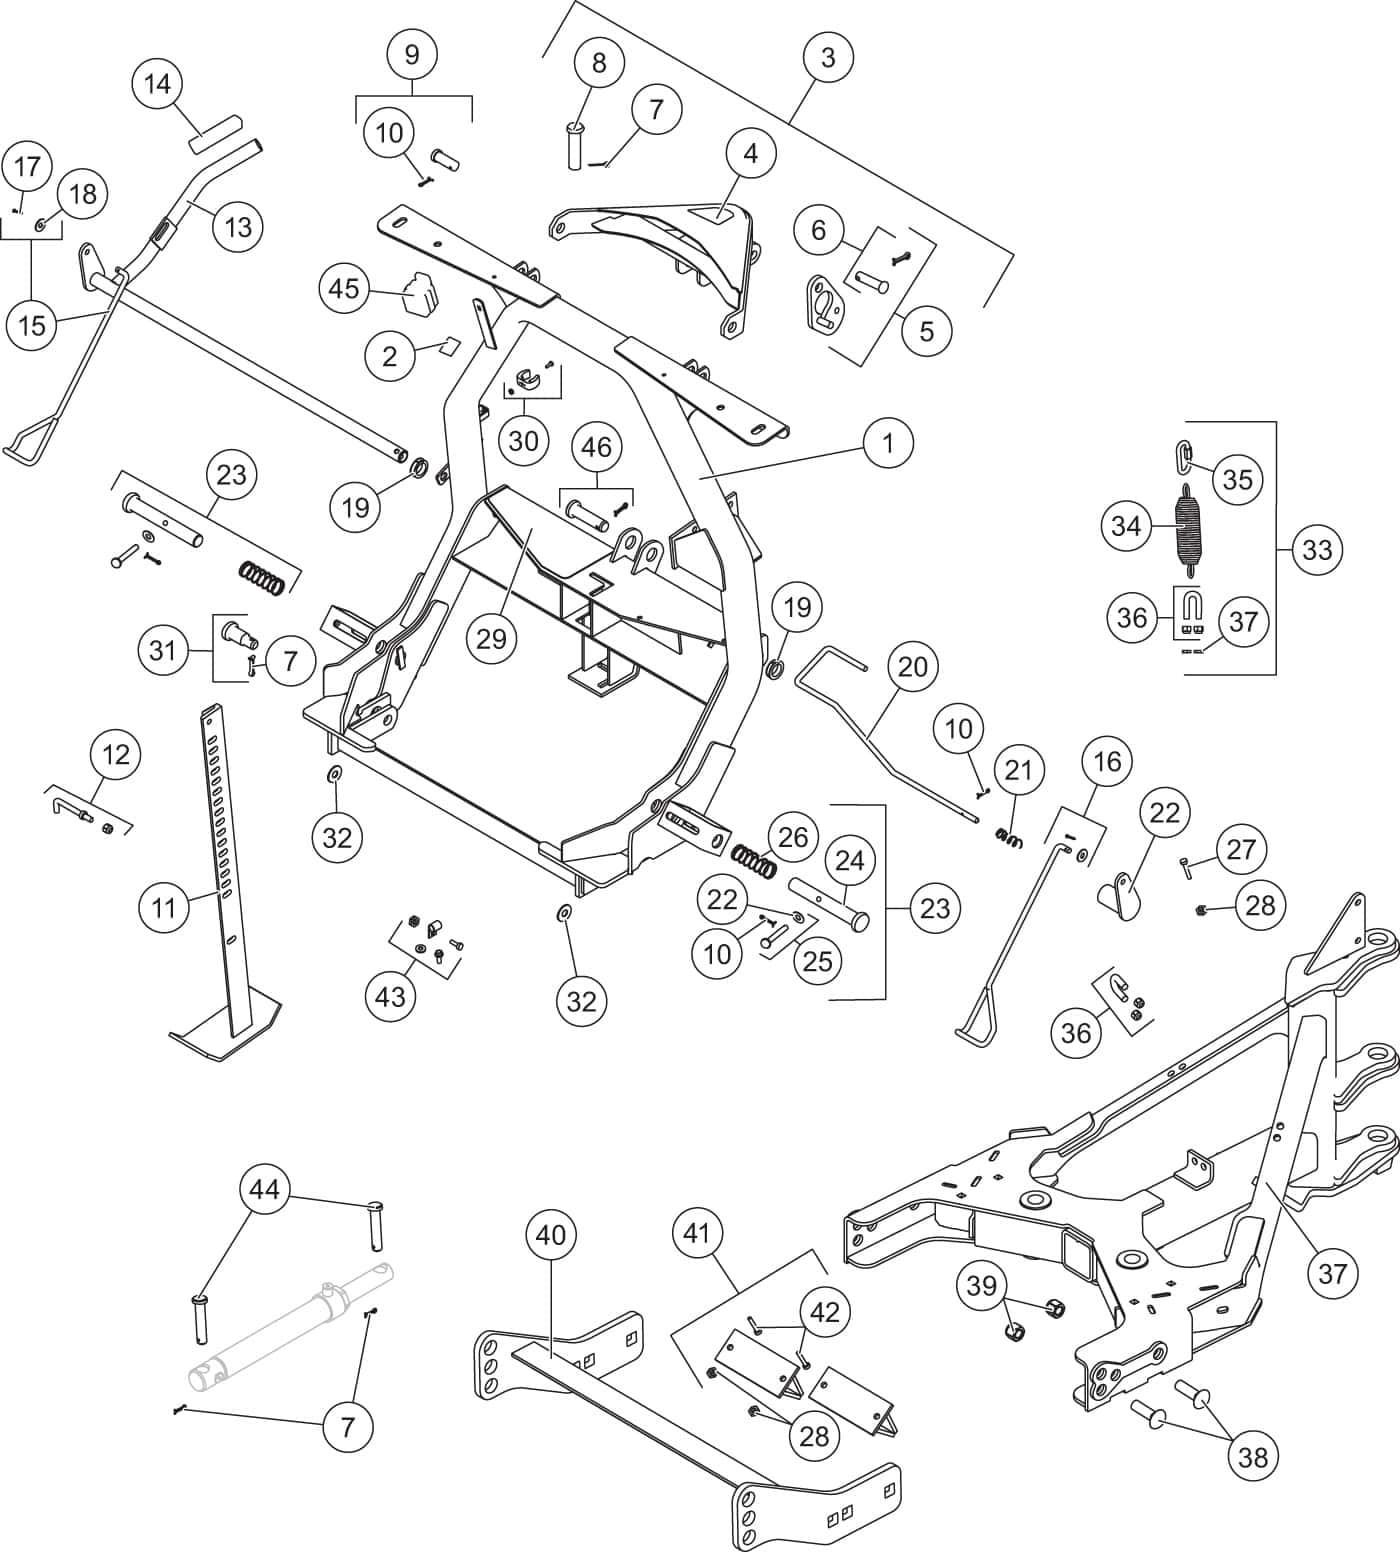 t bucket wiring diagram wiring library Honda Crv Schematics boss plow wiring diagram truck side fisher xv2 hatf xv2 headgear and t frame shop iteparts